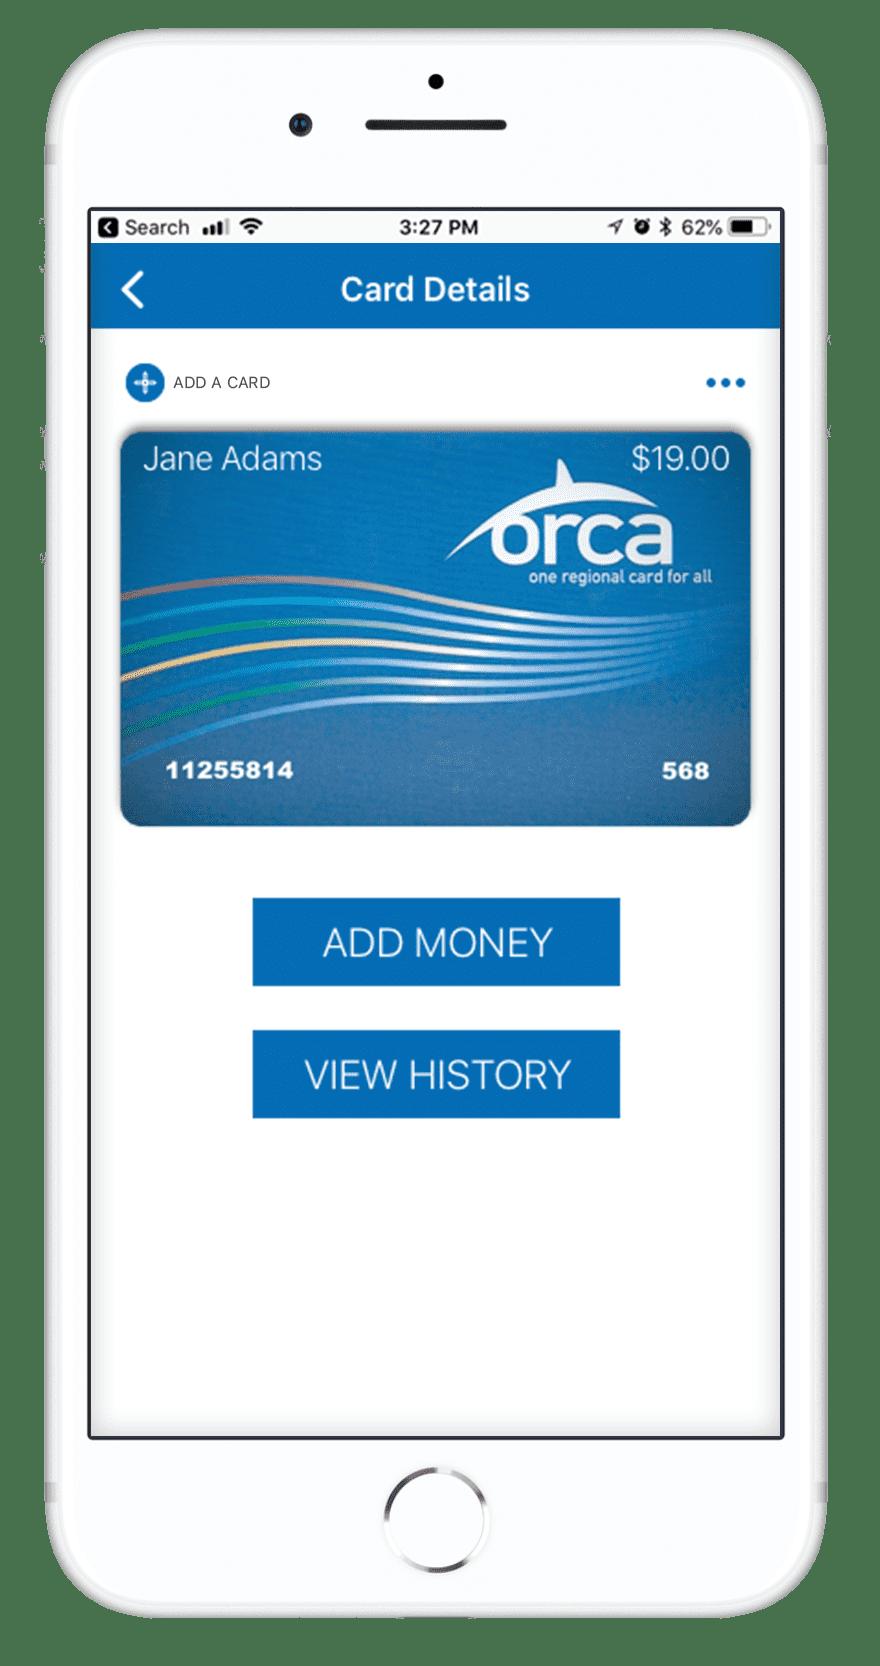 Orca Card 2 - Jane Adams - Card Details